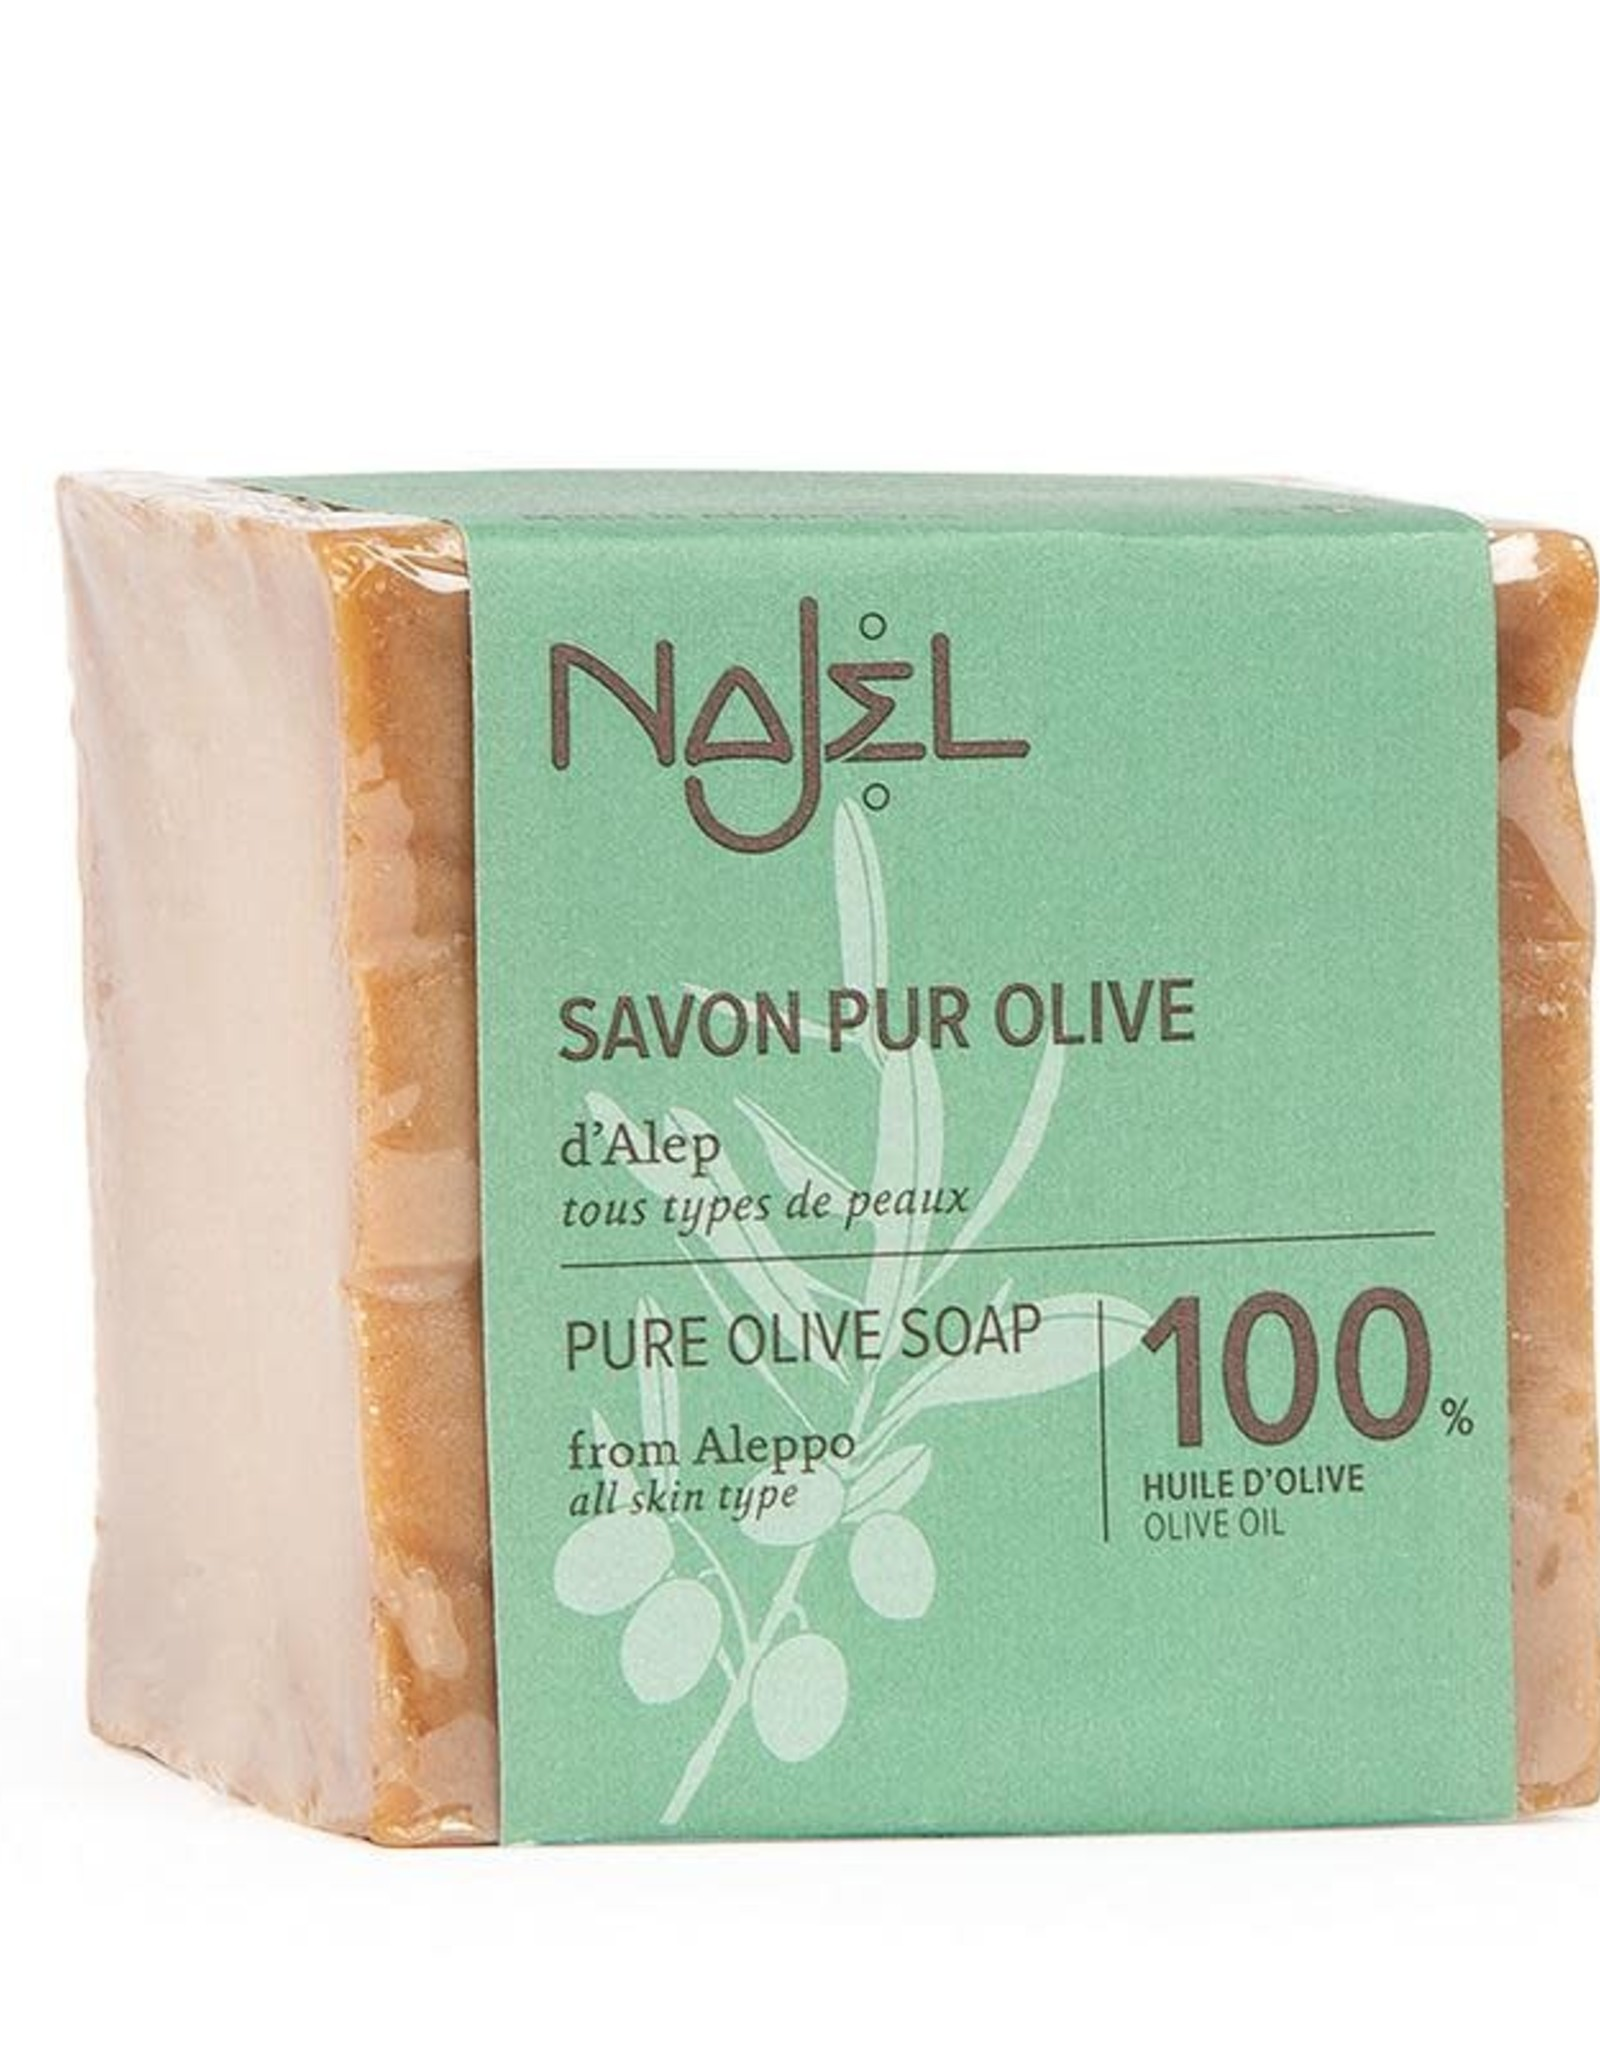 Najel Aleppo zeep olijf olie 100% 200 g